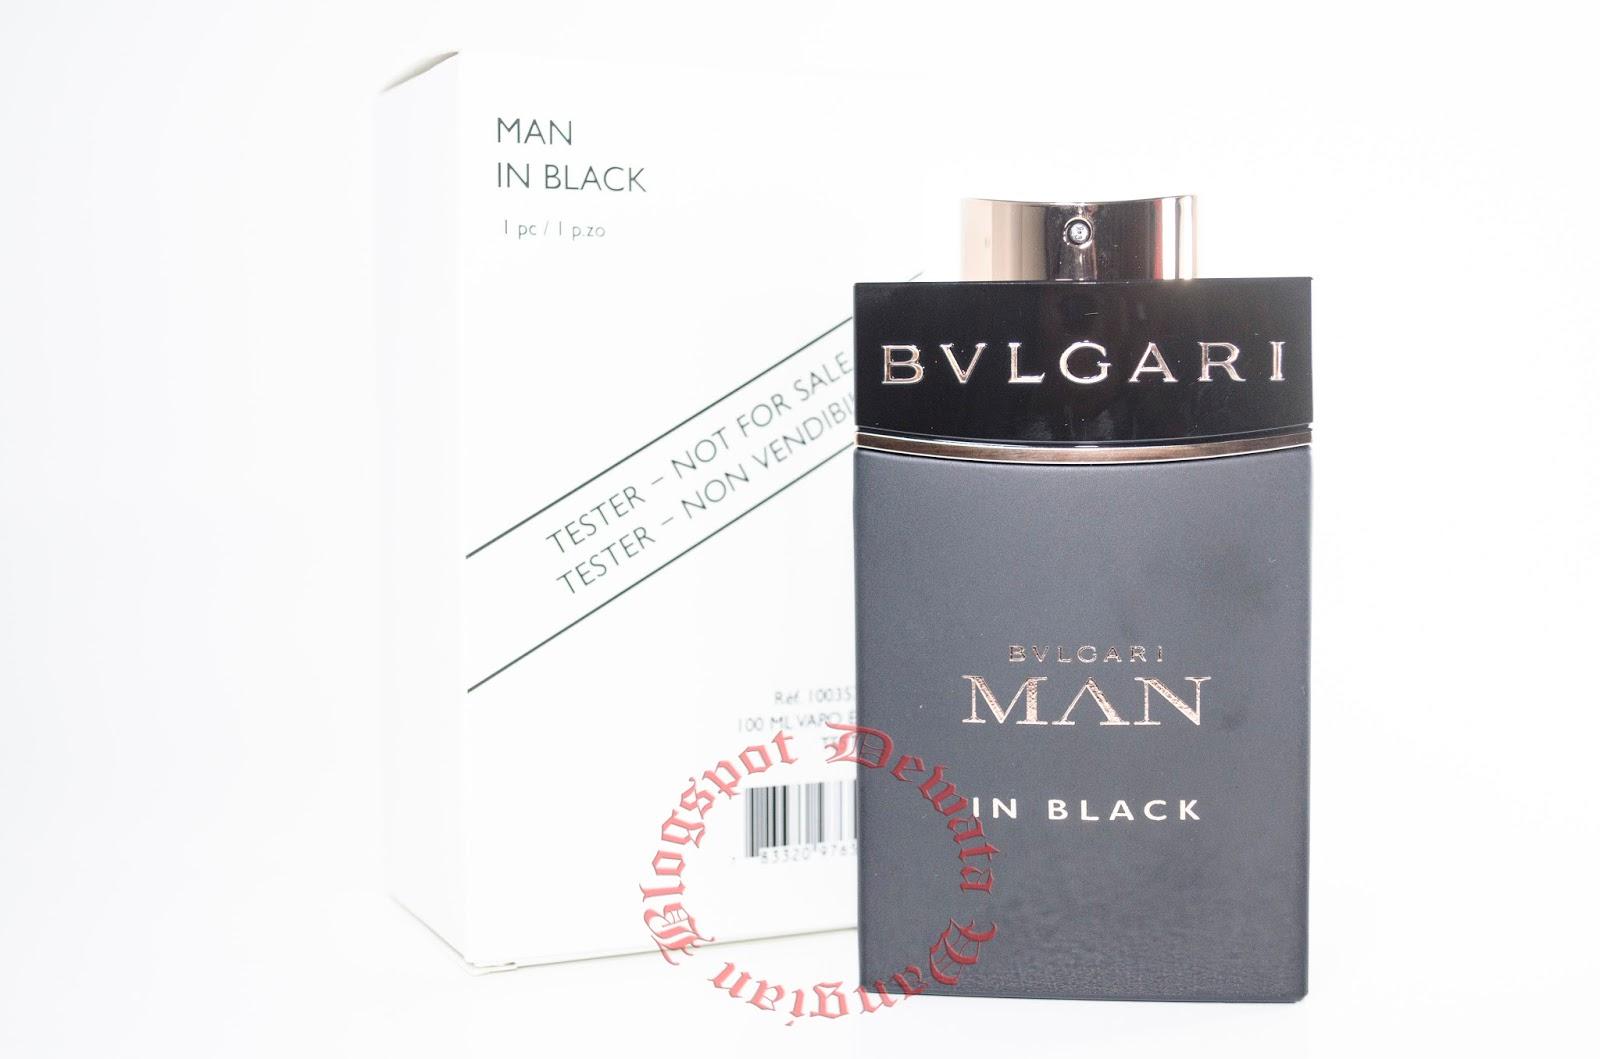 Perfumes For Guys V4 Restock Parfum The Body Shop Original Reject White Musk Sport Edt 100 Ml Imghttp 1bpblogspotcom 6bxdte1 I8 Votin8plehi Aaaaaaaafiw E29y46iugmc S1600 Bvlgarimaninblacktester